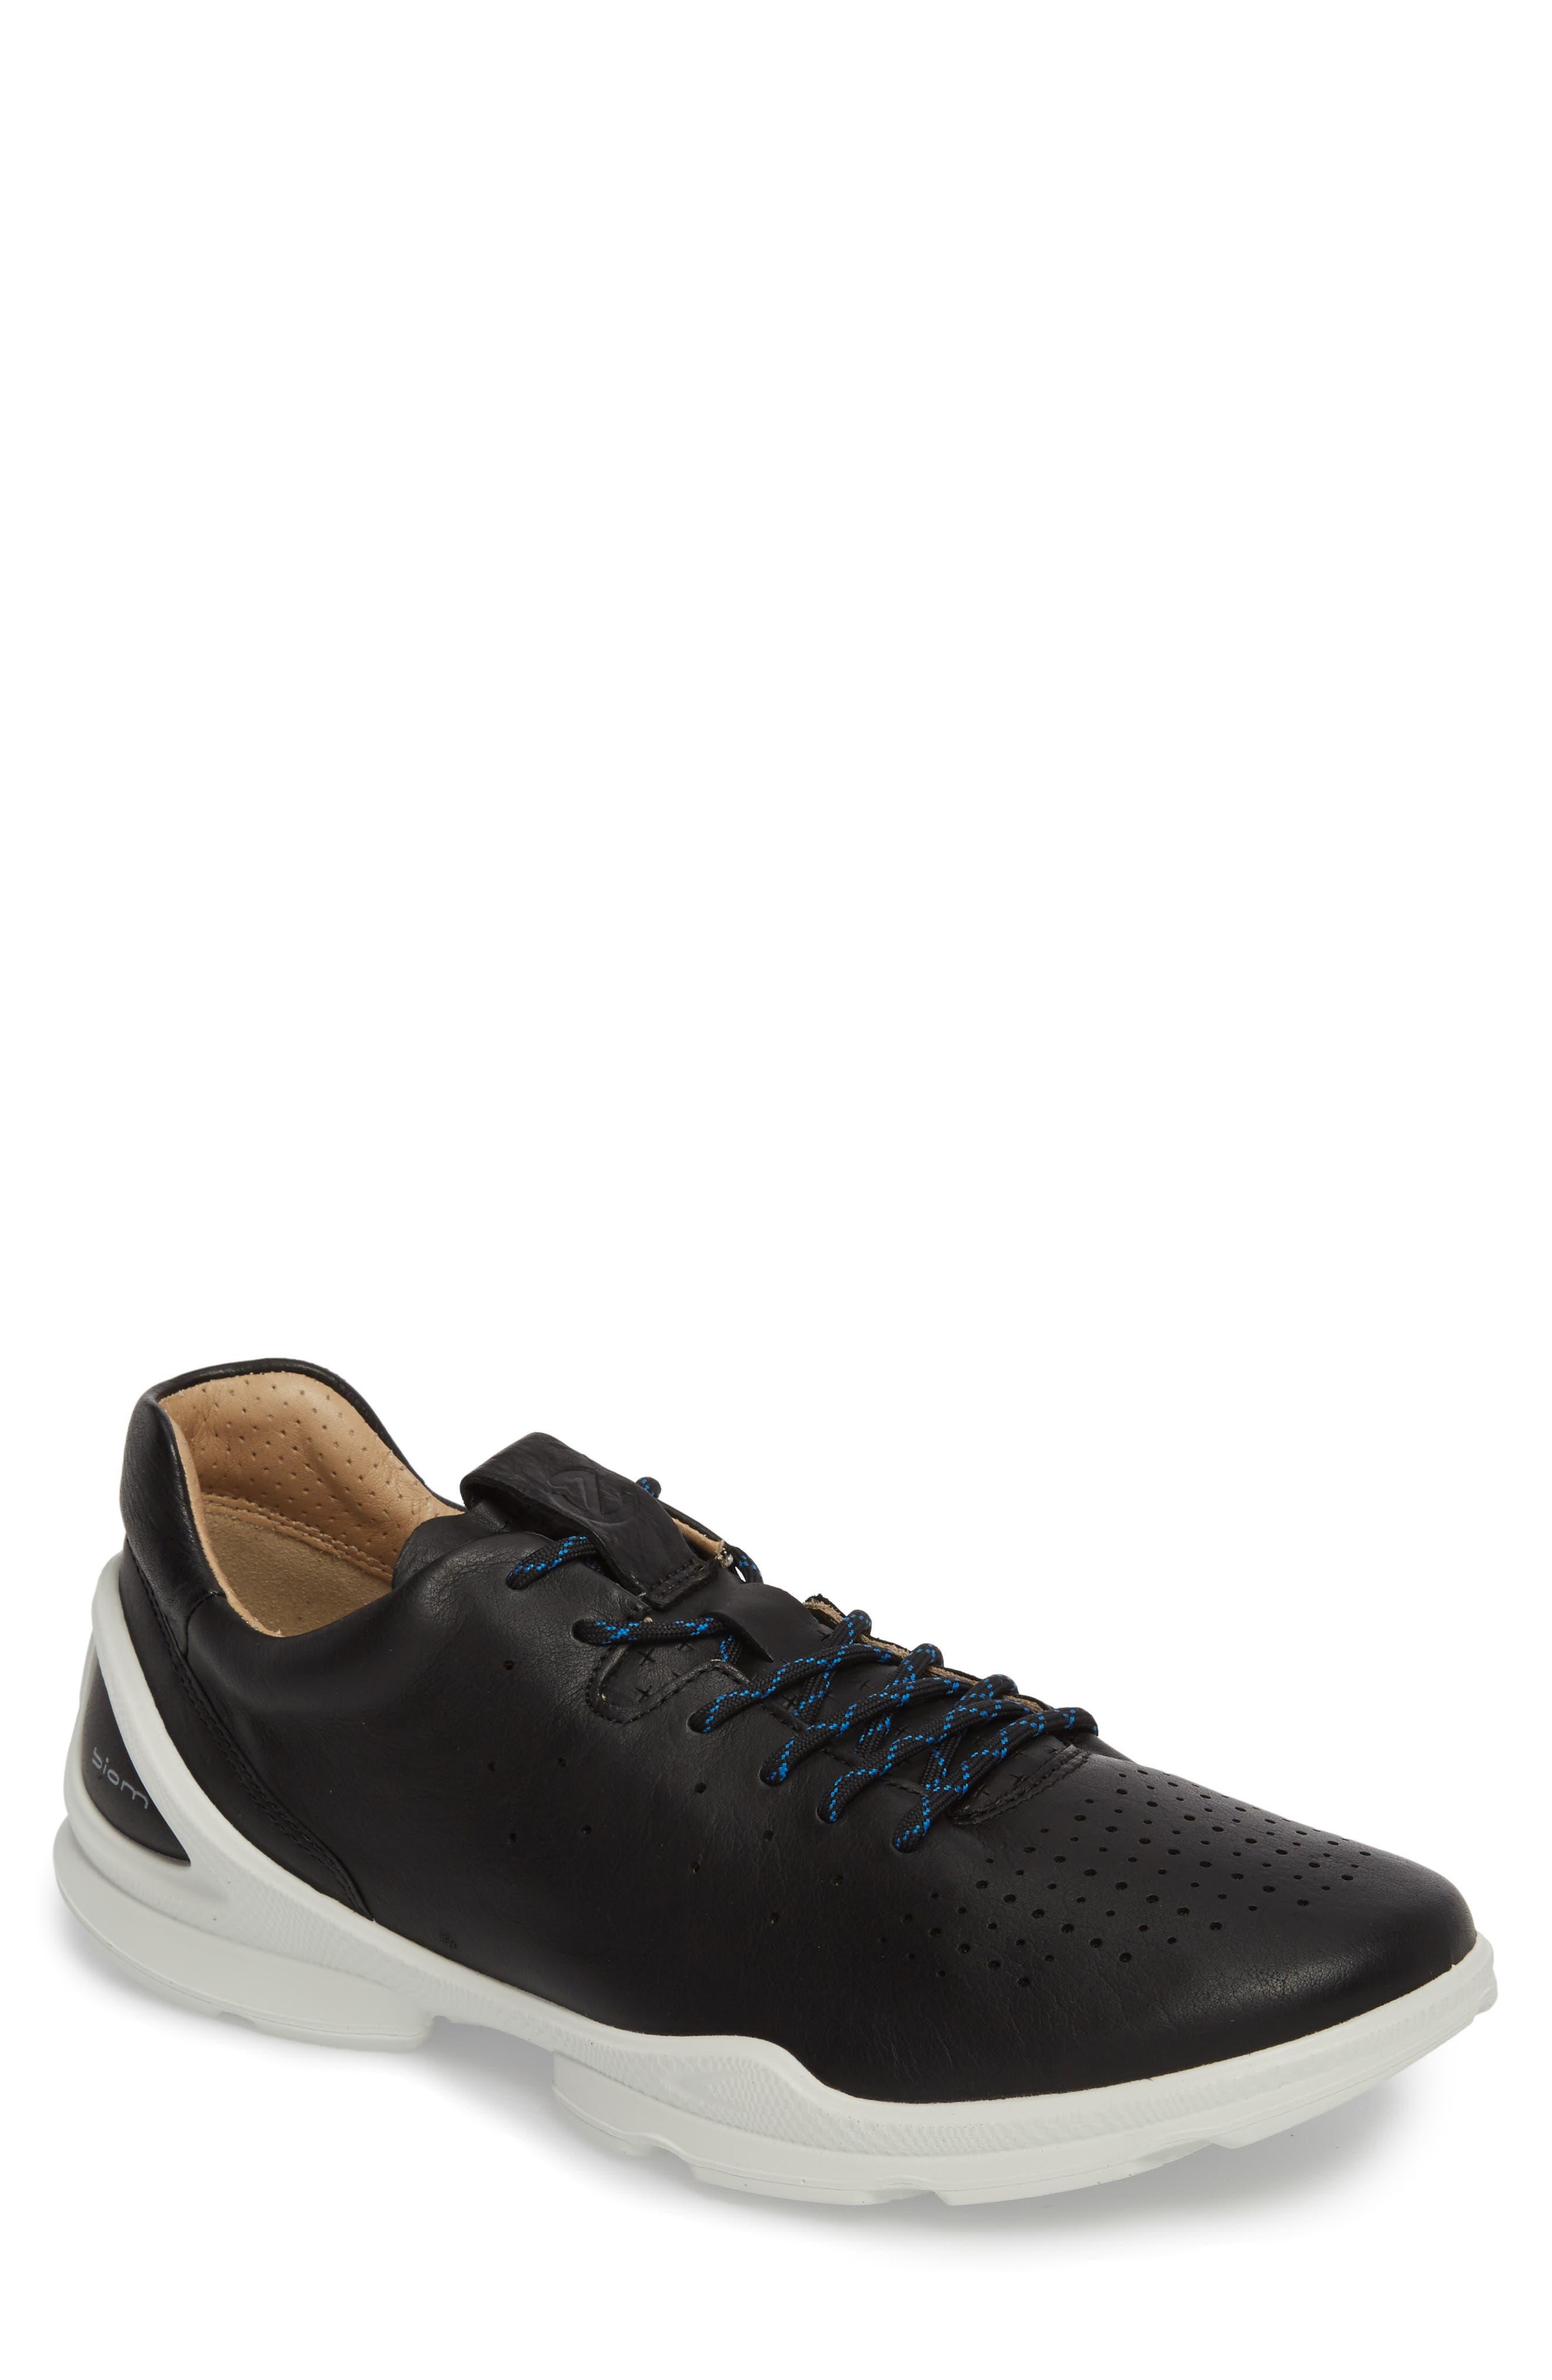 Biom Street Sneaker,                             Main thumbnail 1, color,                             008